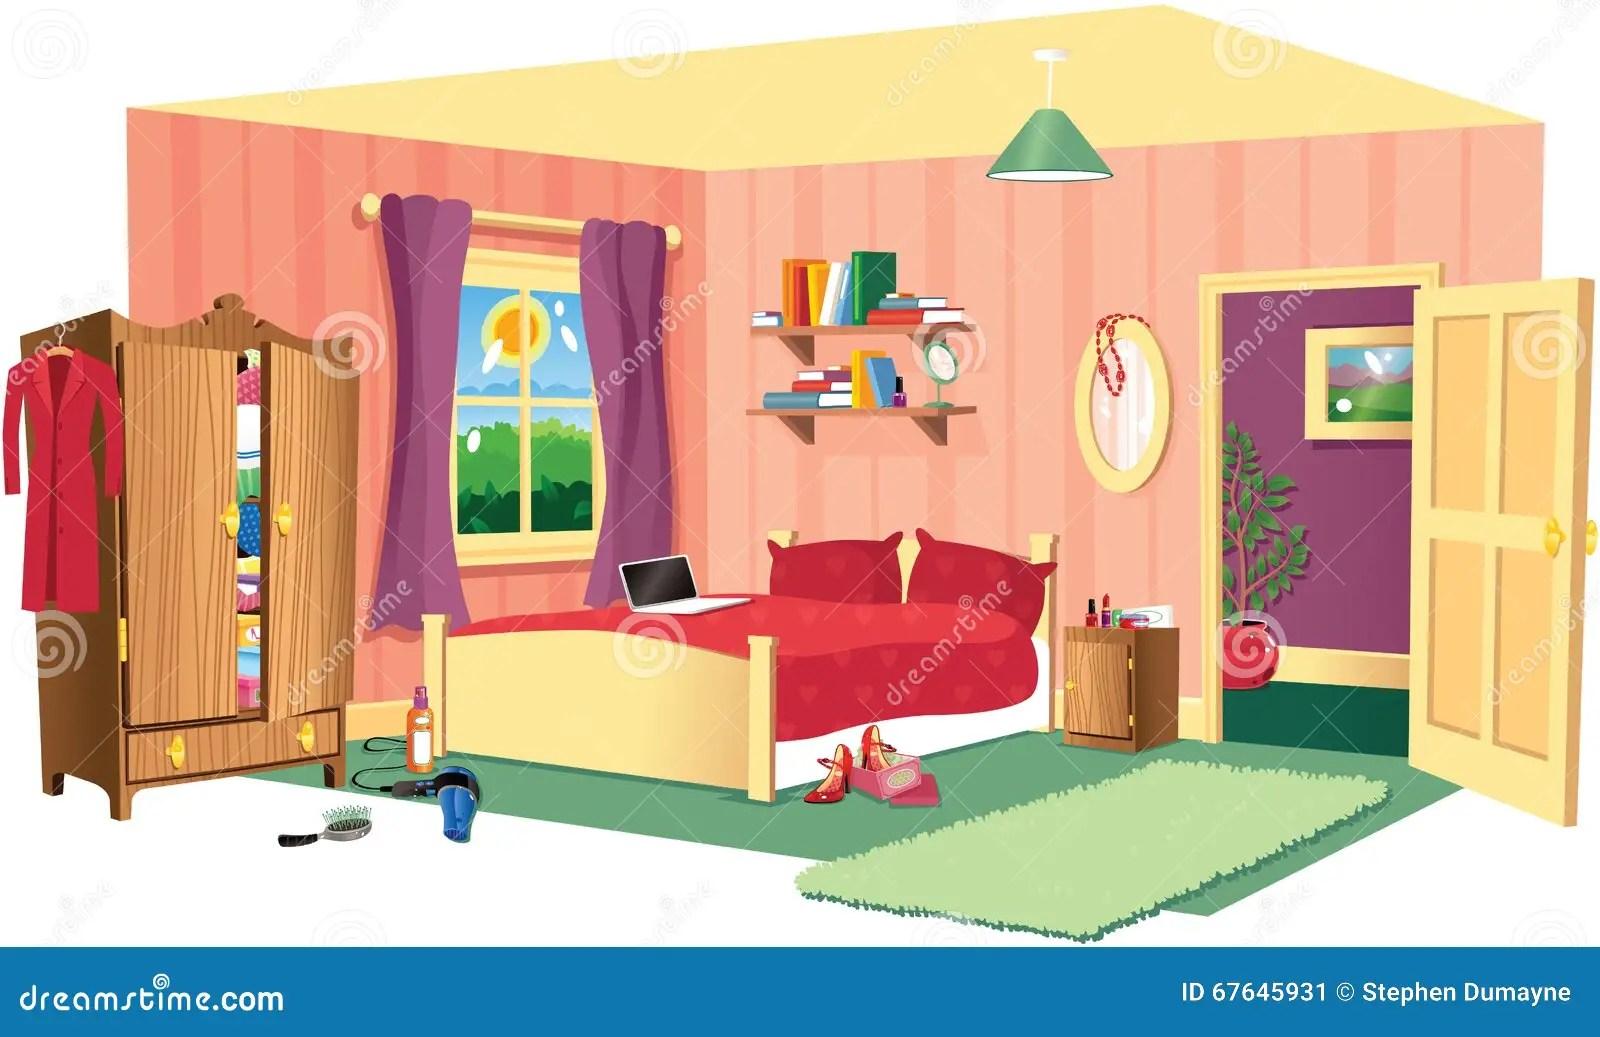 Bedroom Scene Stock Vector Illustration Of Cosy Girls